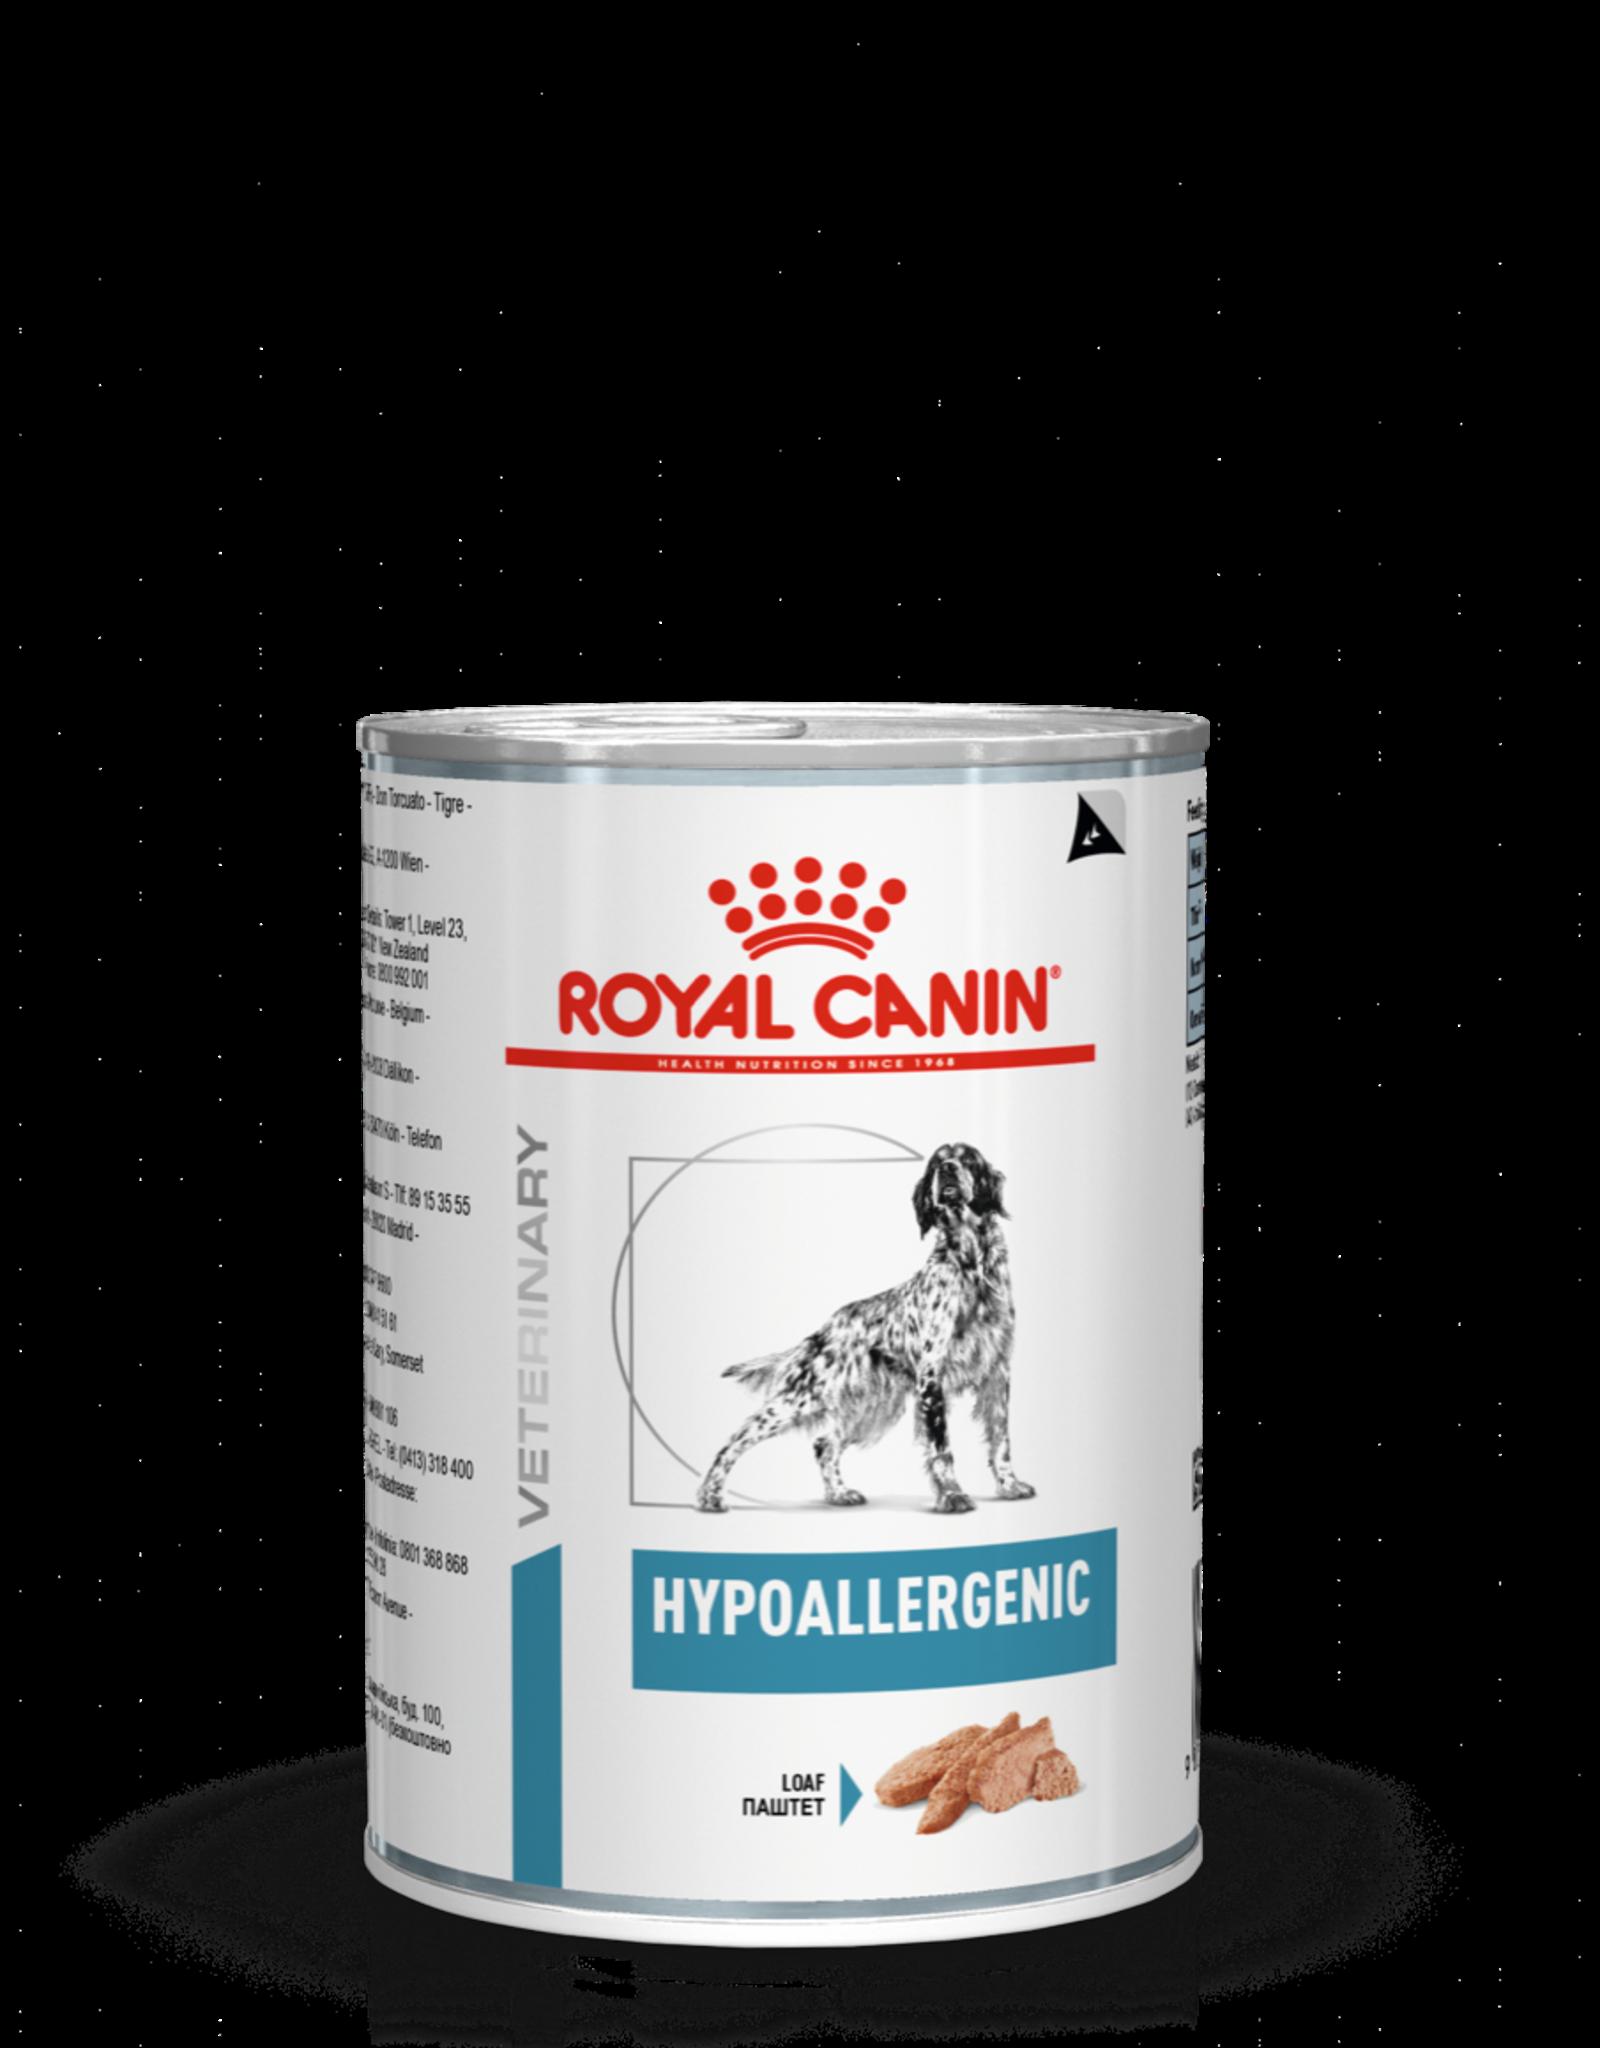 Royal Canin Royal Canin Hypoallergenic Hond 12x400gr